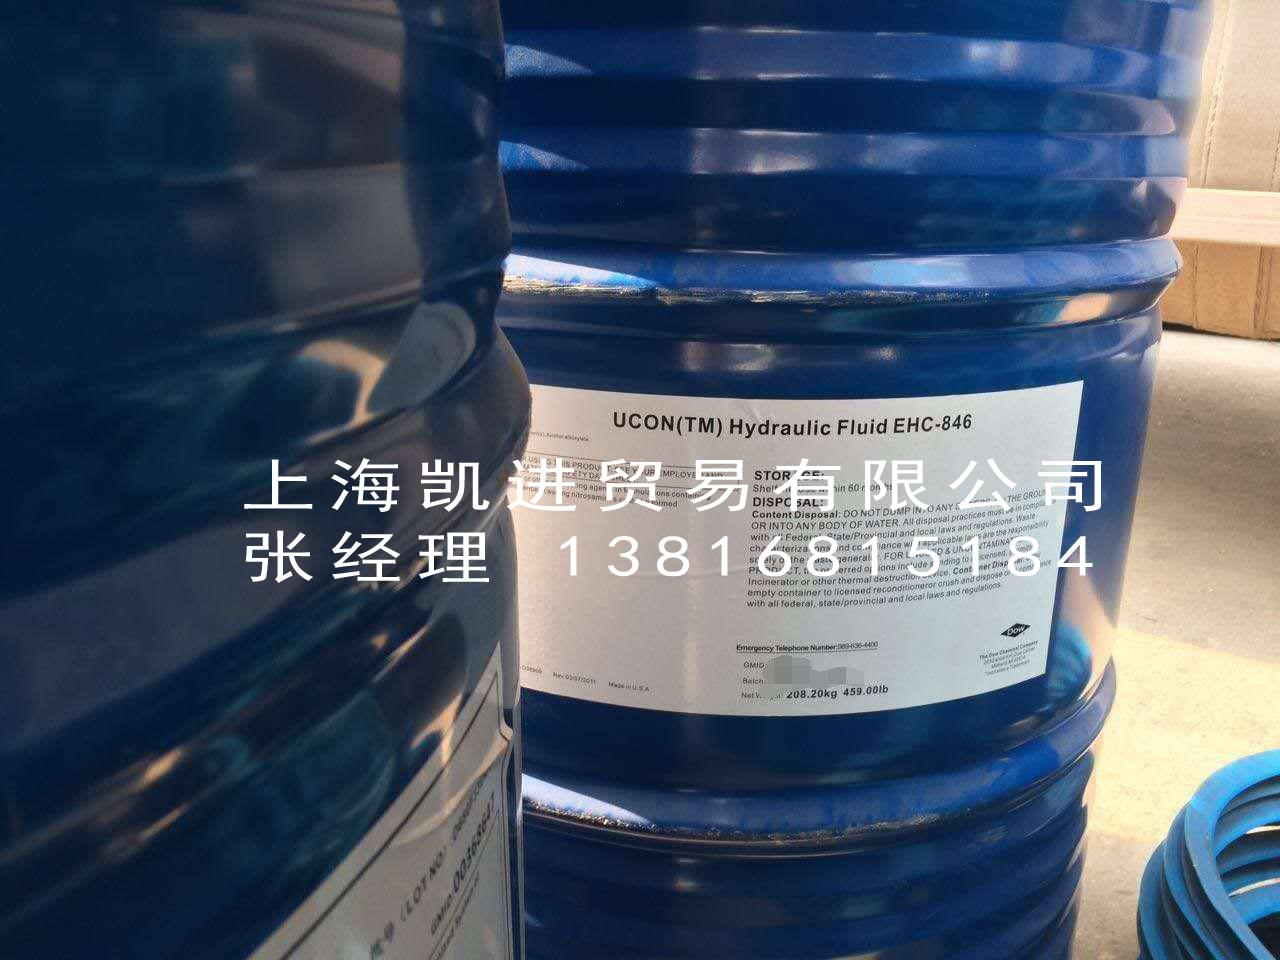 陶氏优康UCON TRIDENT AW 32液压油